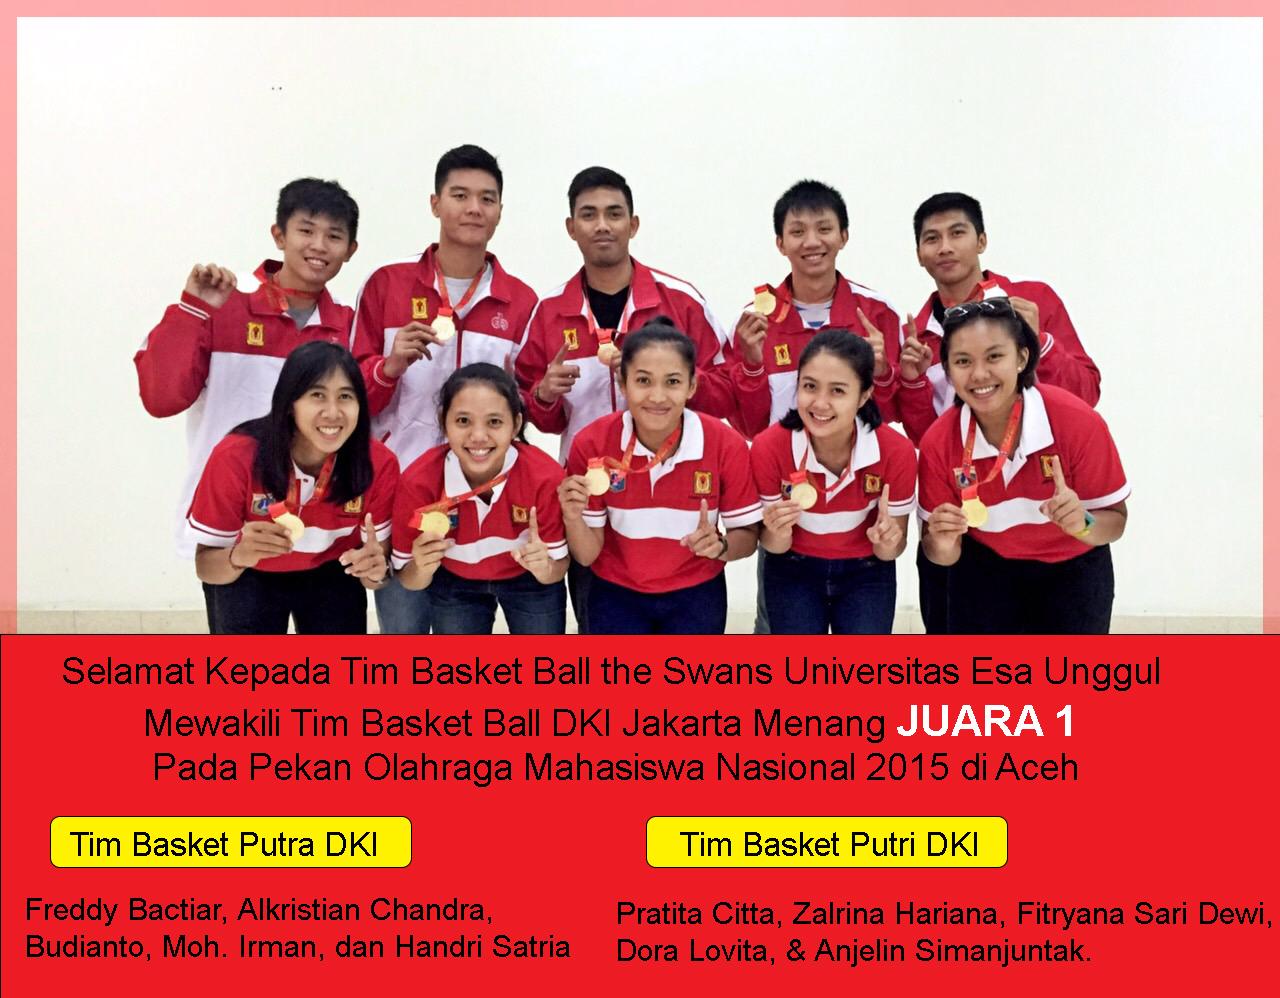 Selamat Kepada Tim Basket Ball the Swans Universitas Esa Unggul Mewakili Tim Basket Ball DKI Jakarta Menang Juara 1 Pada Pekan Olahraga Mahasiswa Nasional 2015 di Aceh